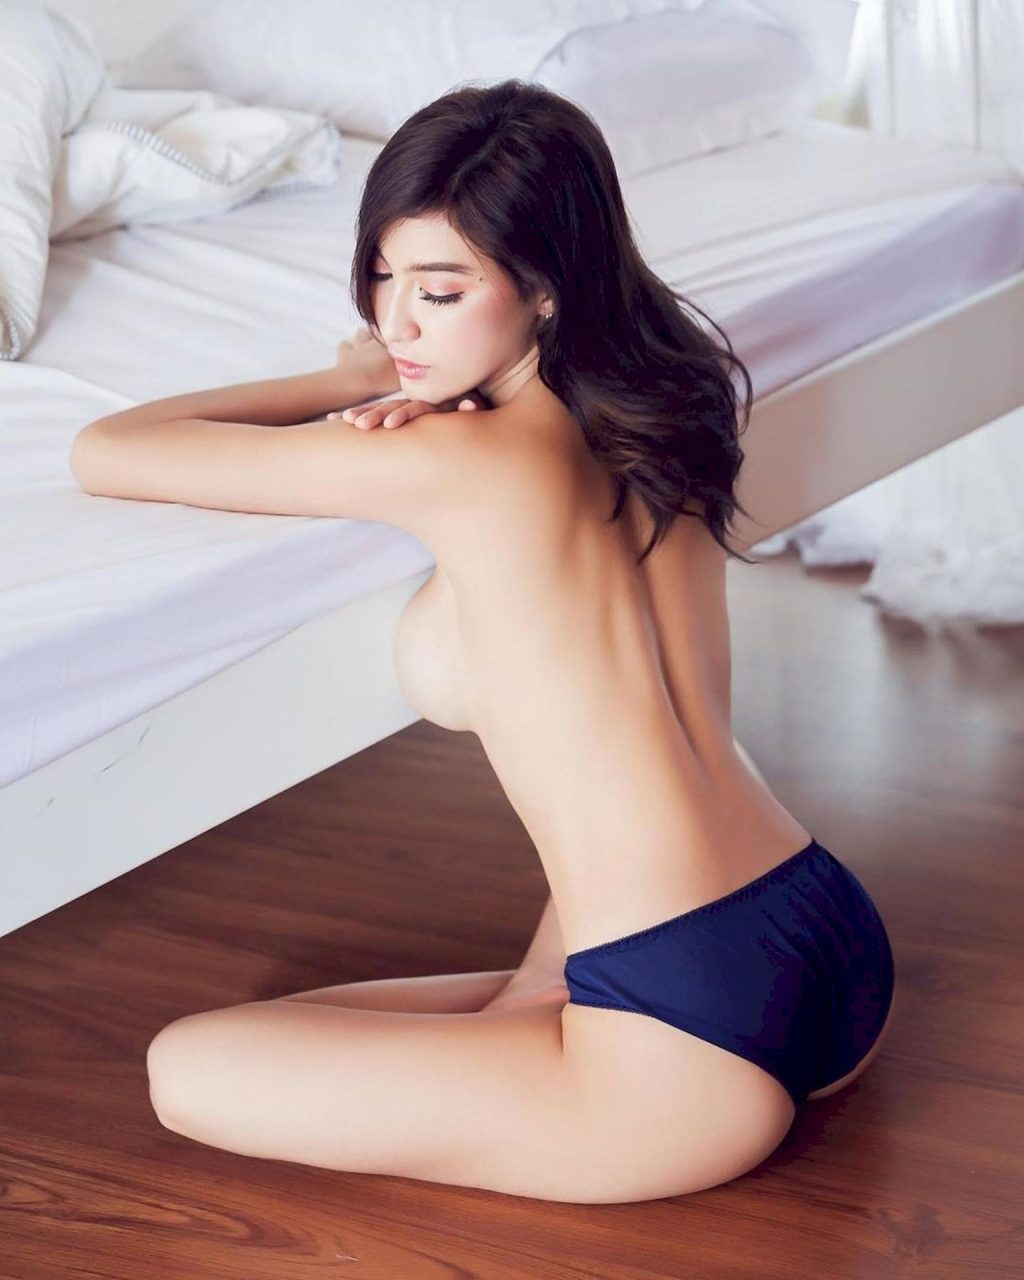 Bunny Franziie Nude & Sexy (36 Photos)